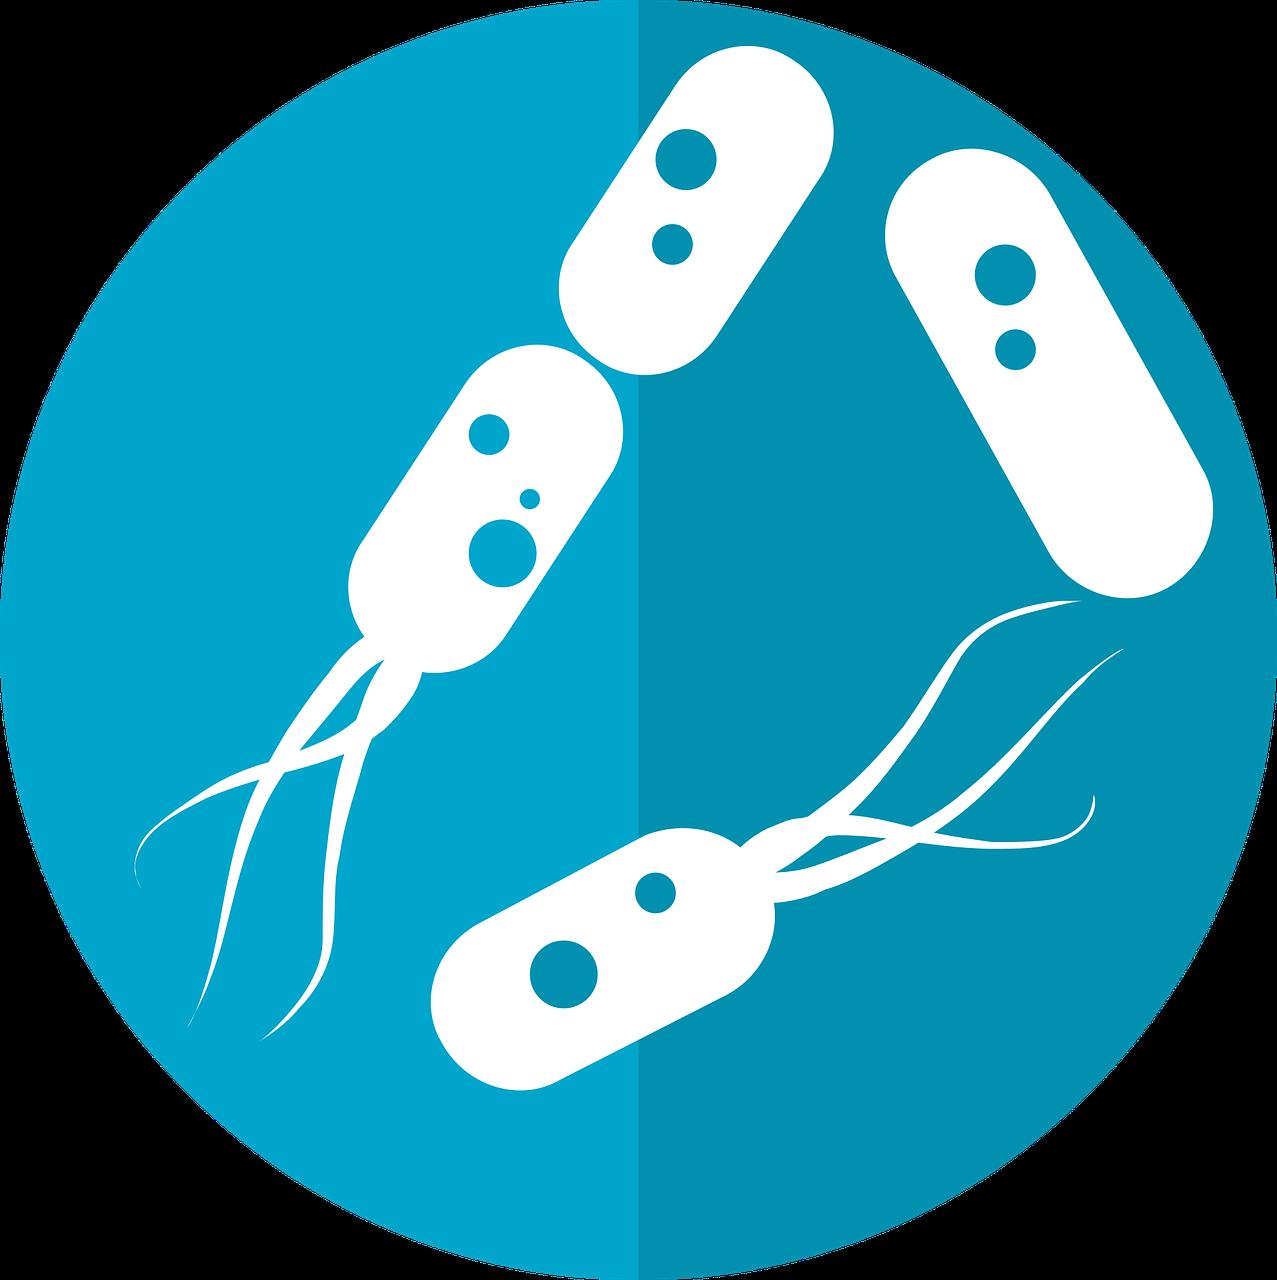 microbiome bacteria image